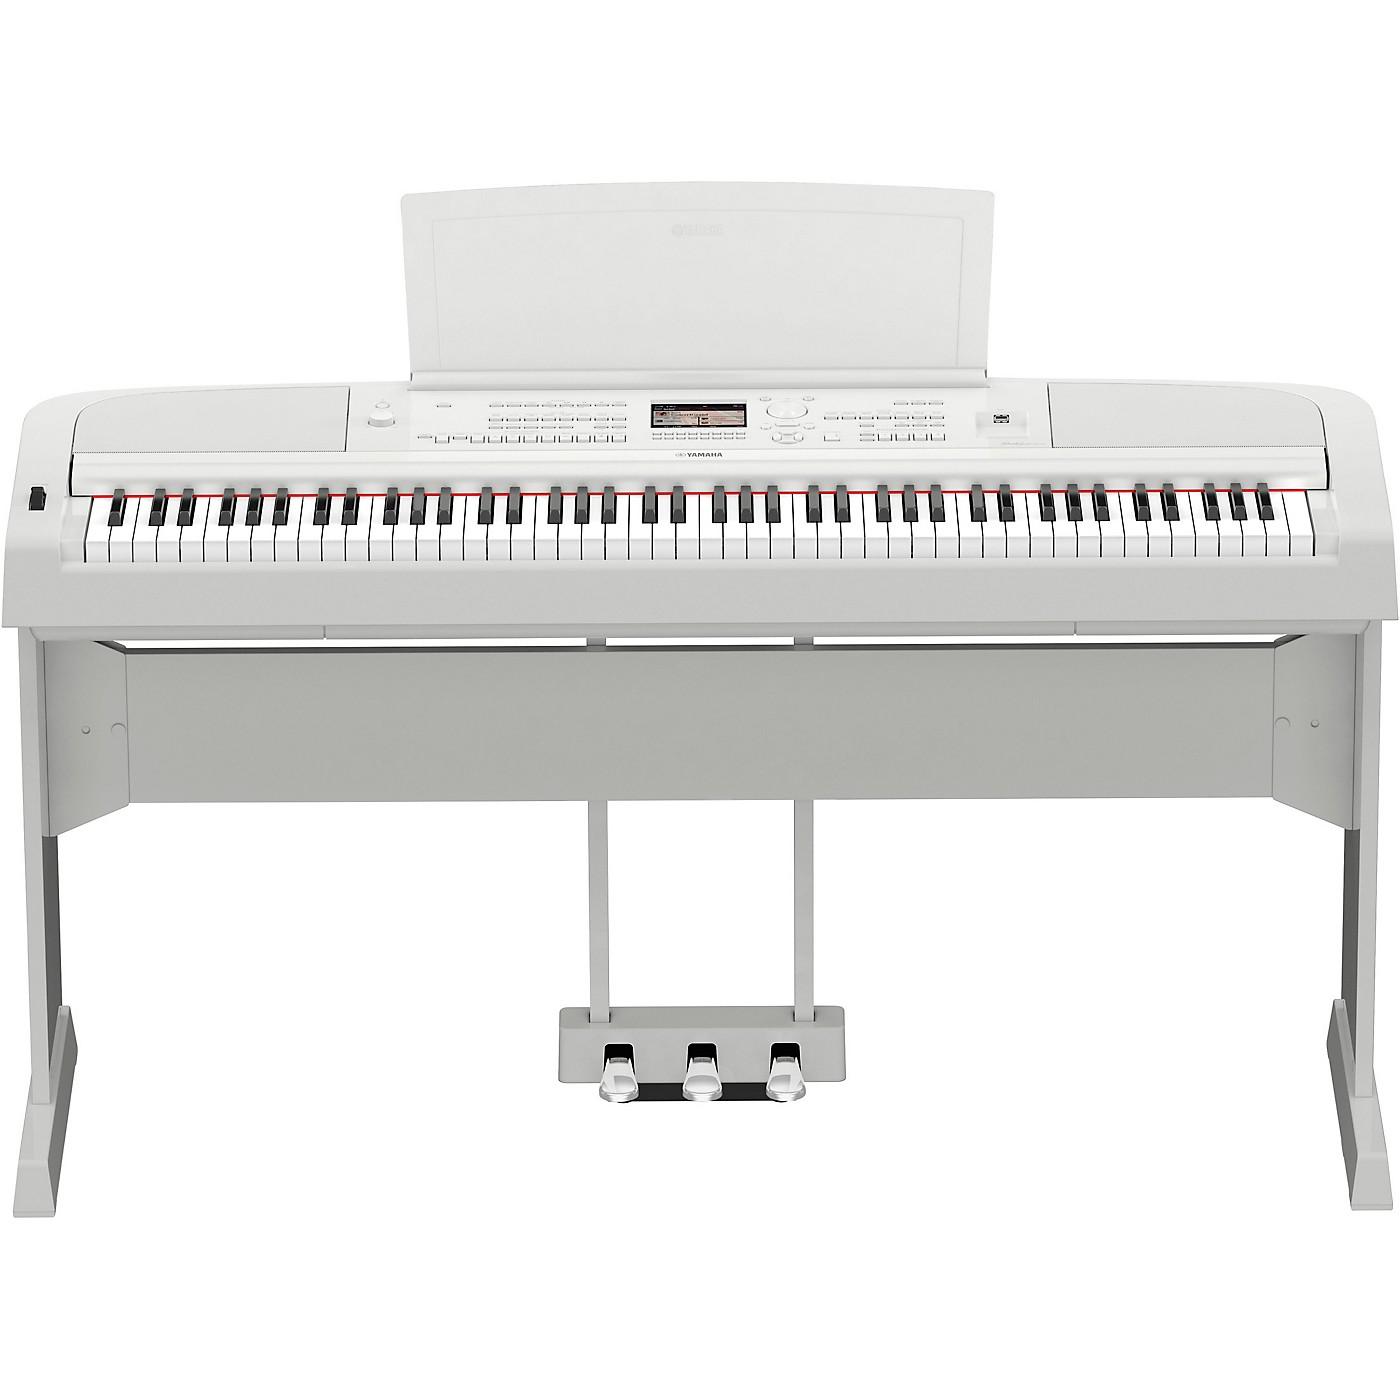 Yamaha DGX-670 Keyboard with Matching Stand and Pedal thumbnail